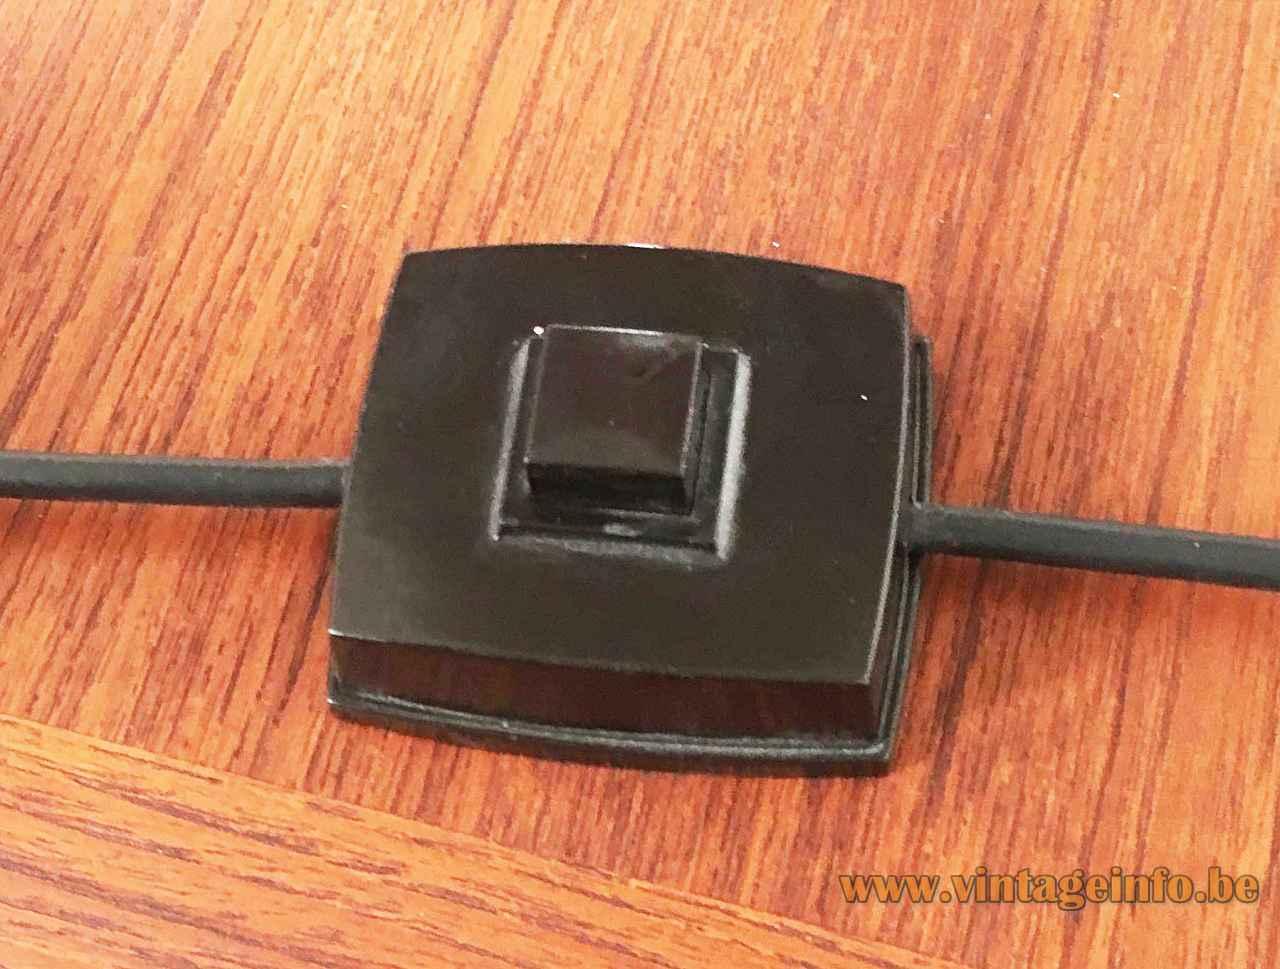 Hustadt-Leuchten yellow mushroom desk lamp square black plastic switch 1970s Germany